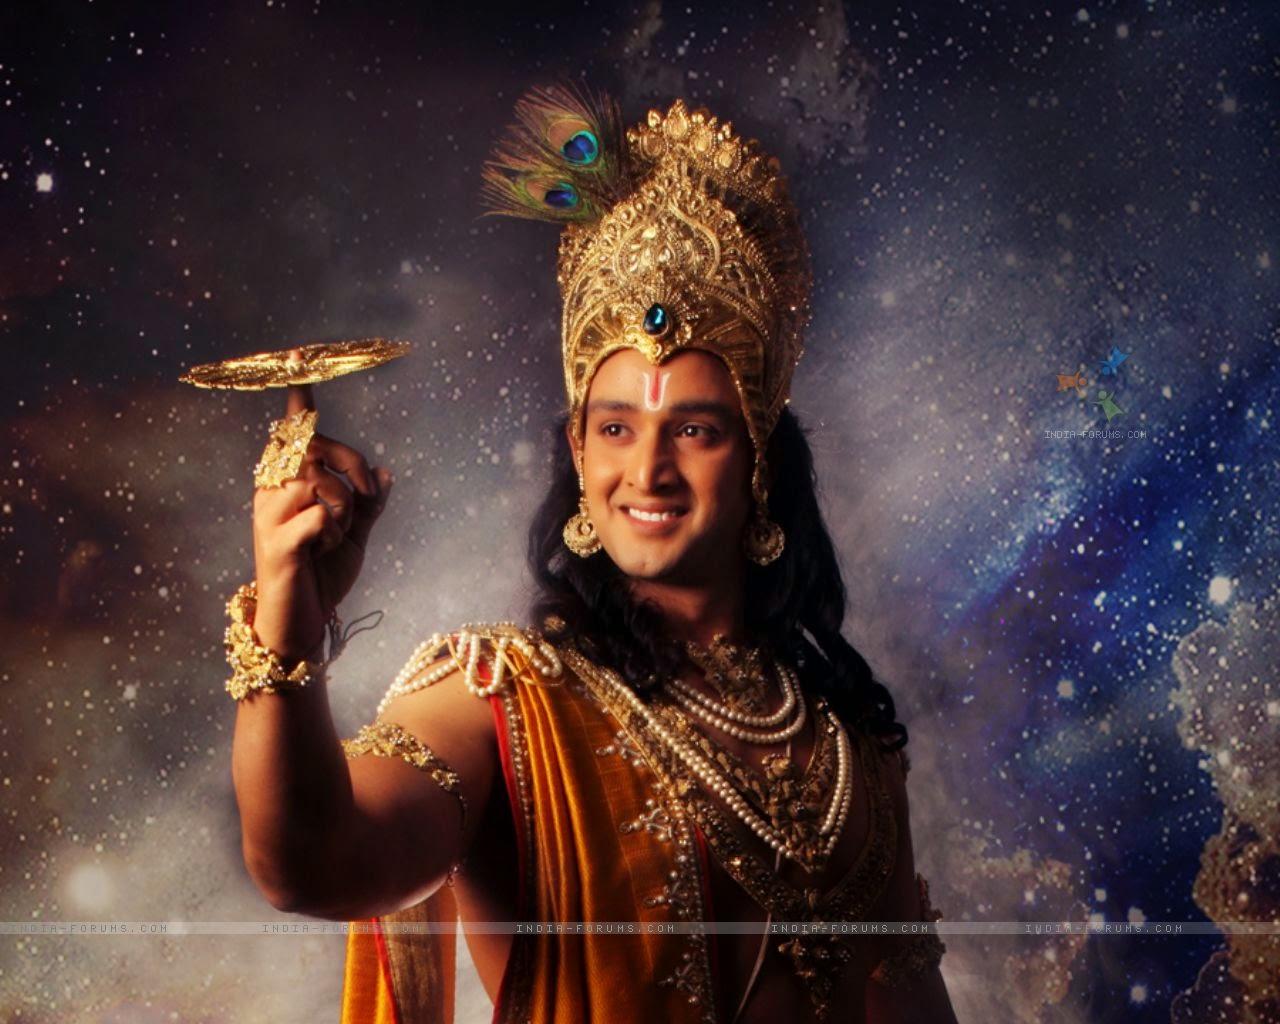 Saurabh Raj Jain Pemeran Khrisna di Mahabharata